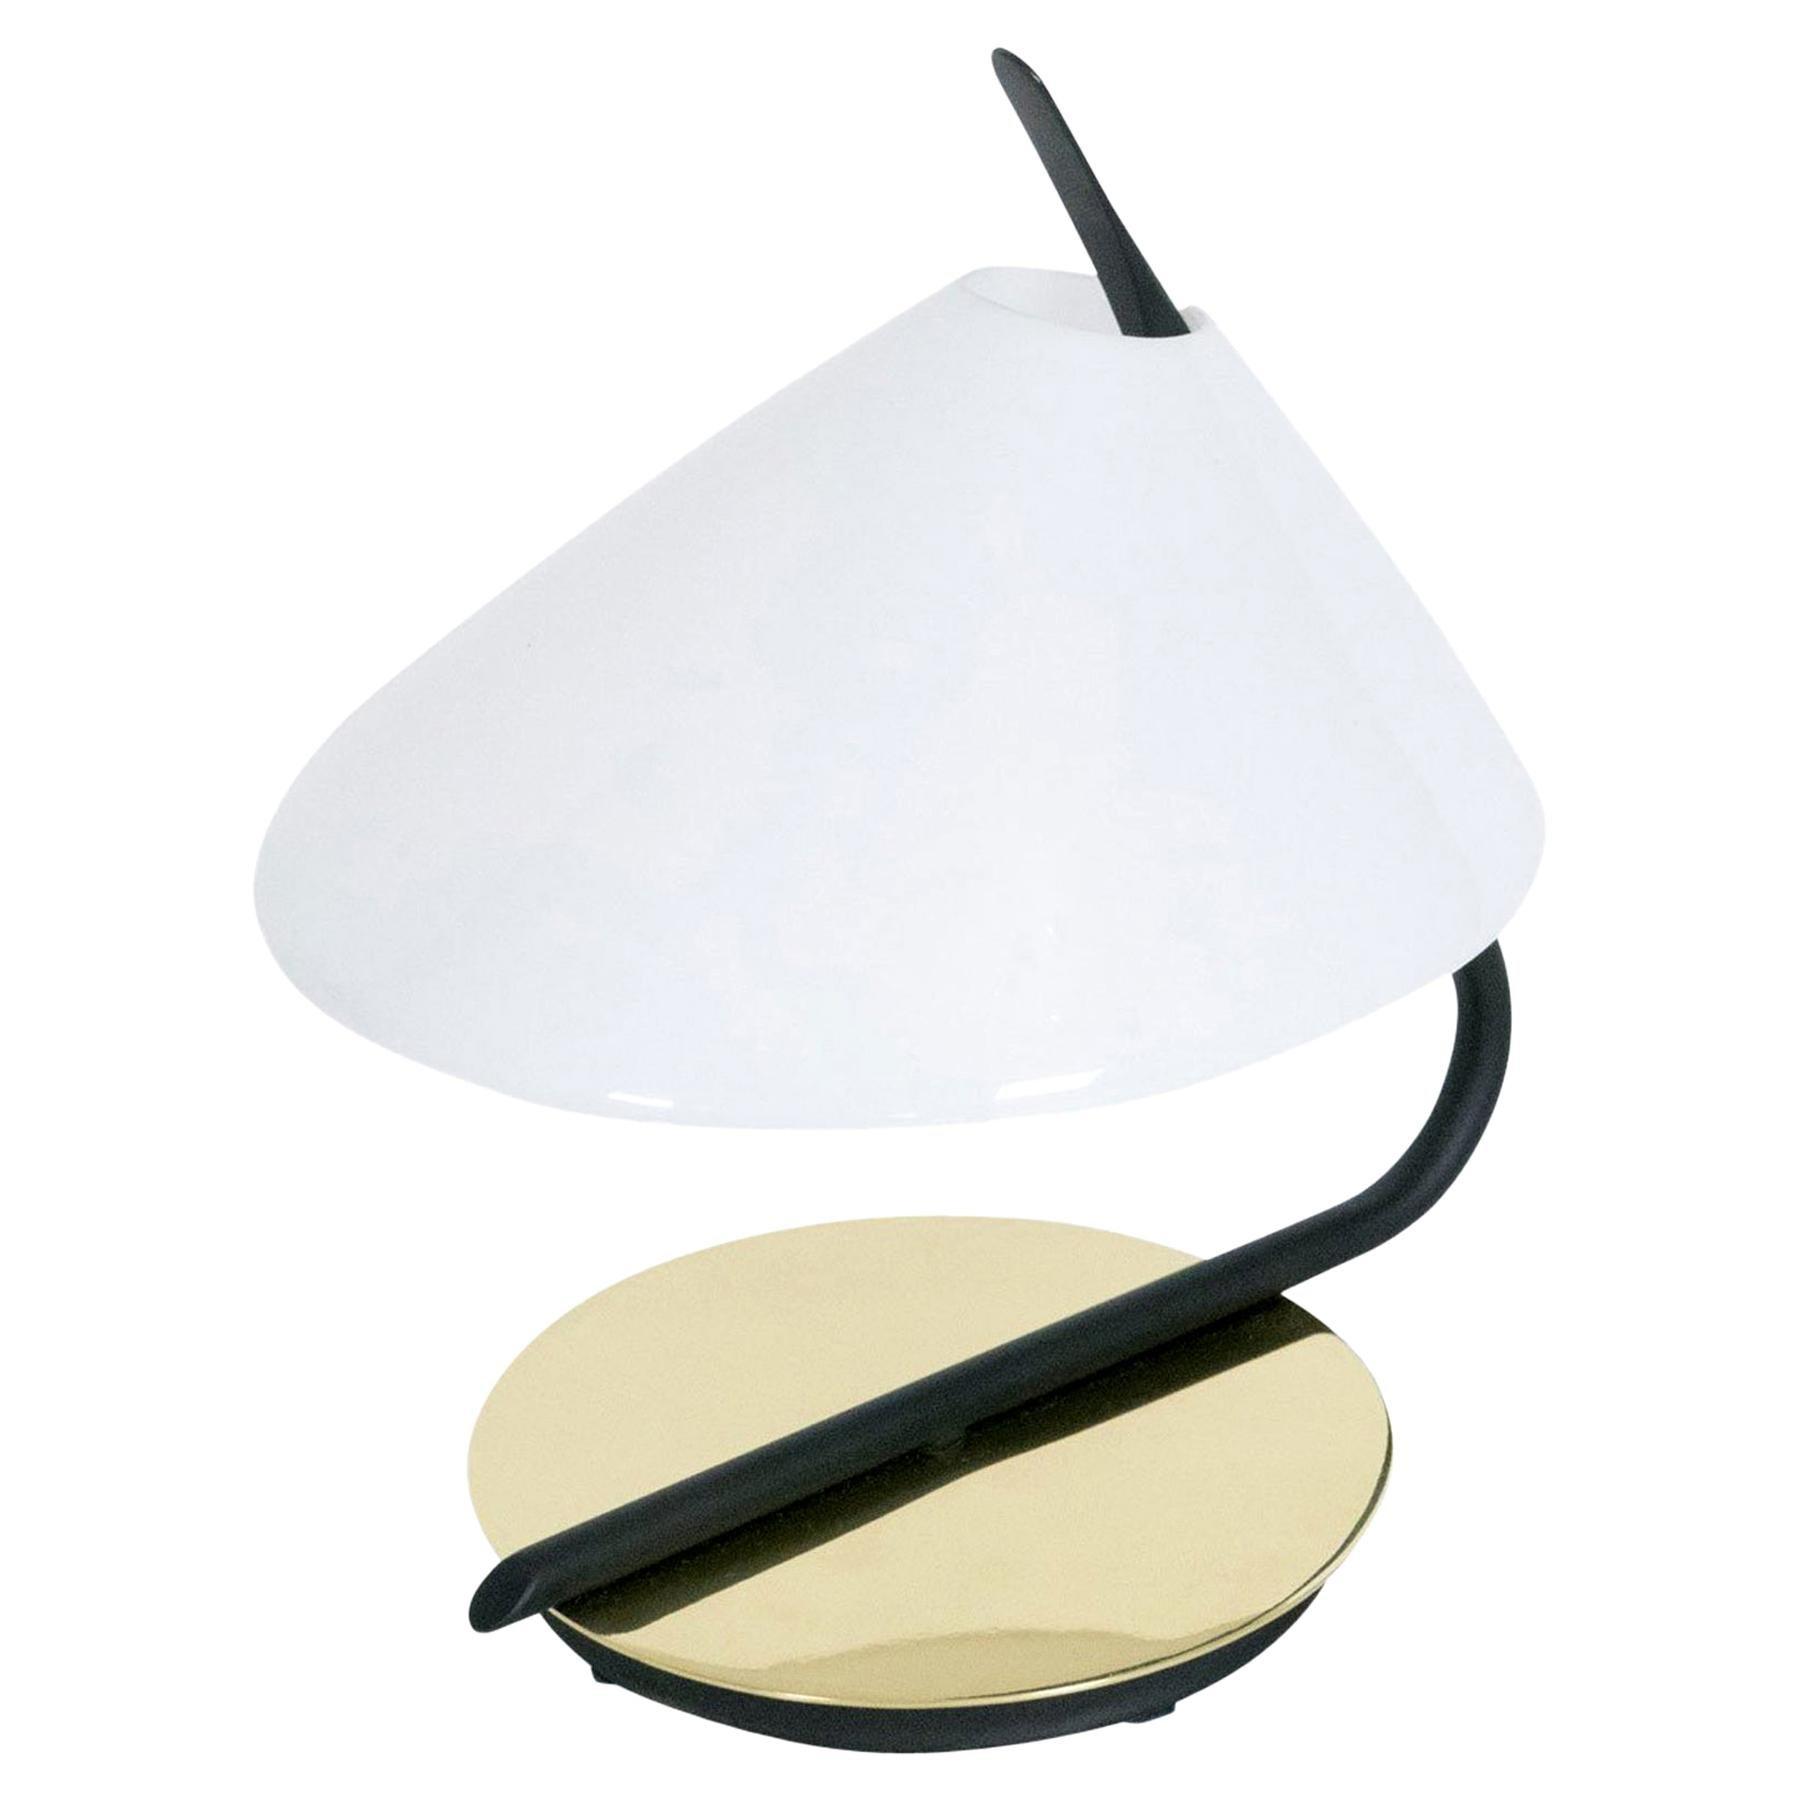 Passy Primo Table Lamp by Bourgeois Boheme Atelier